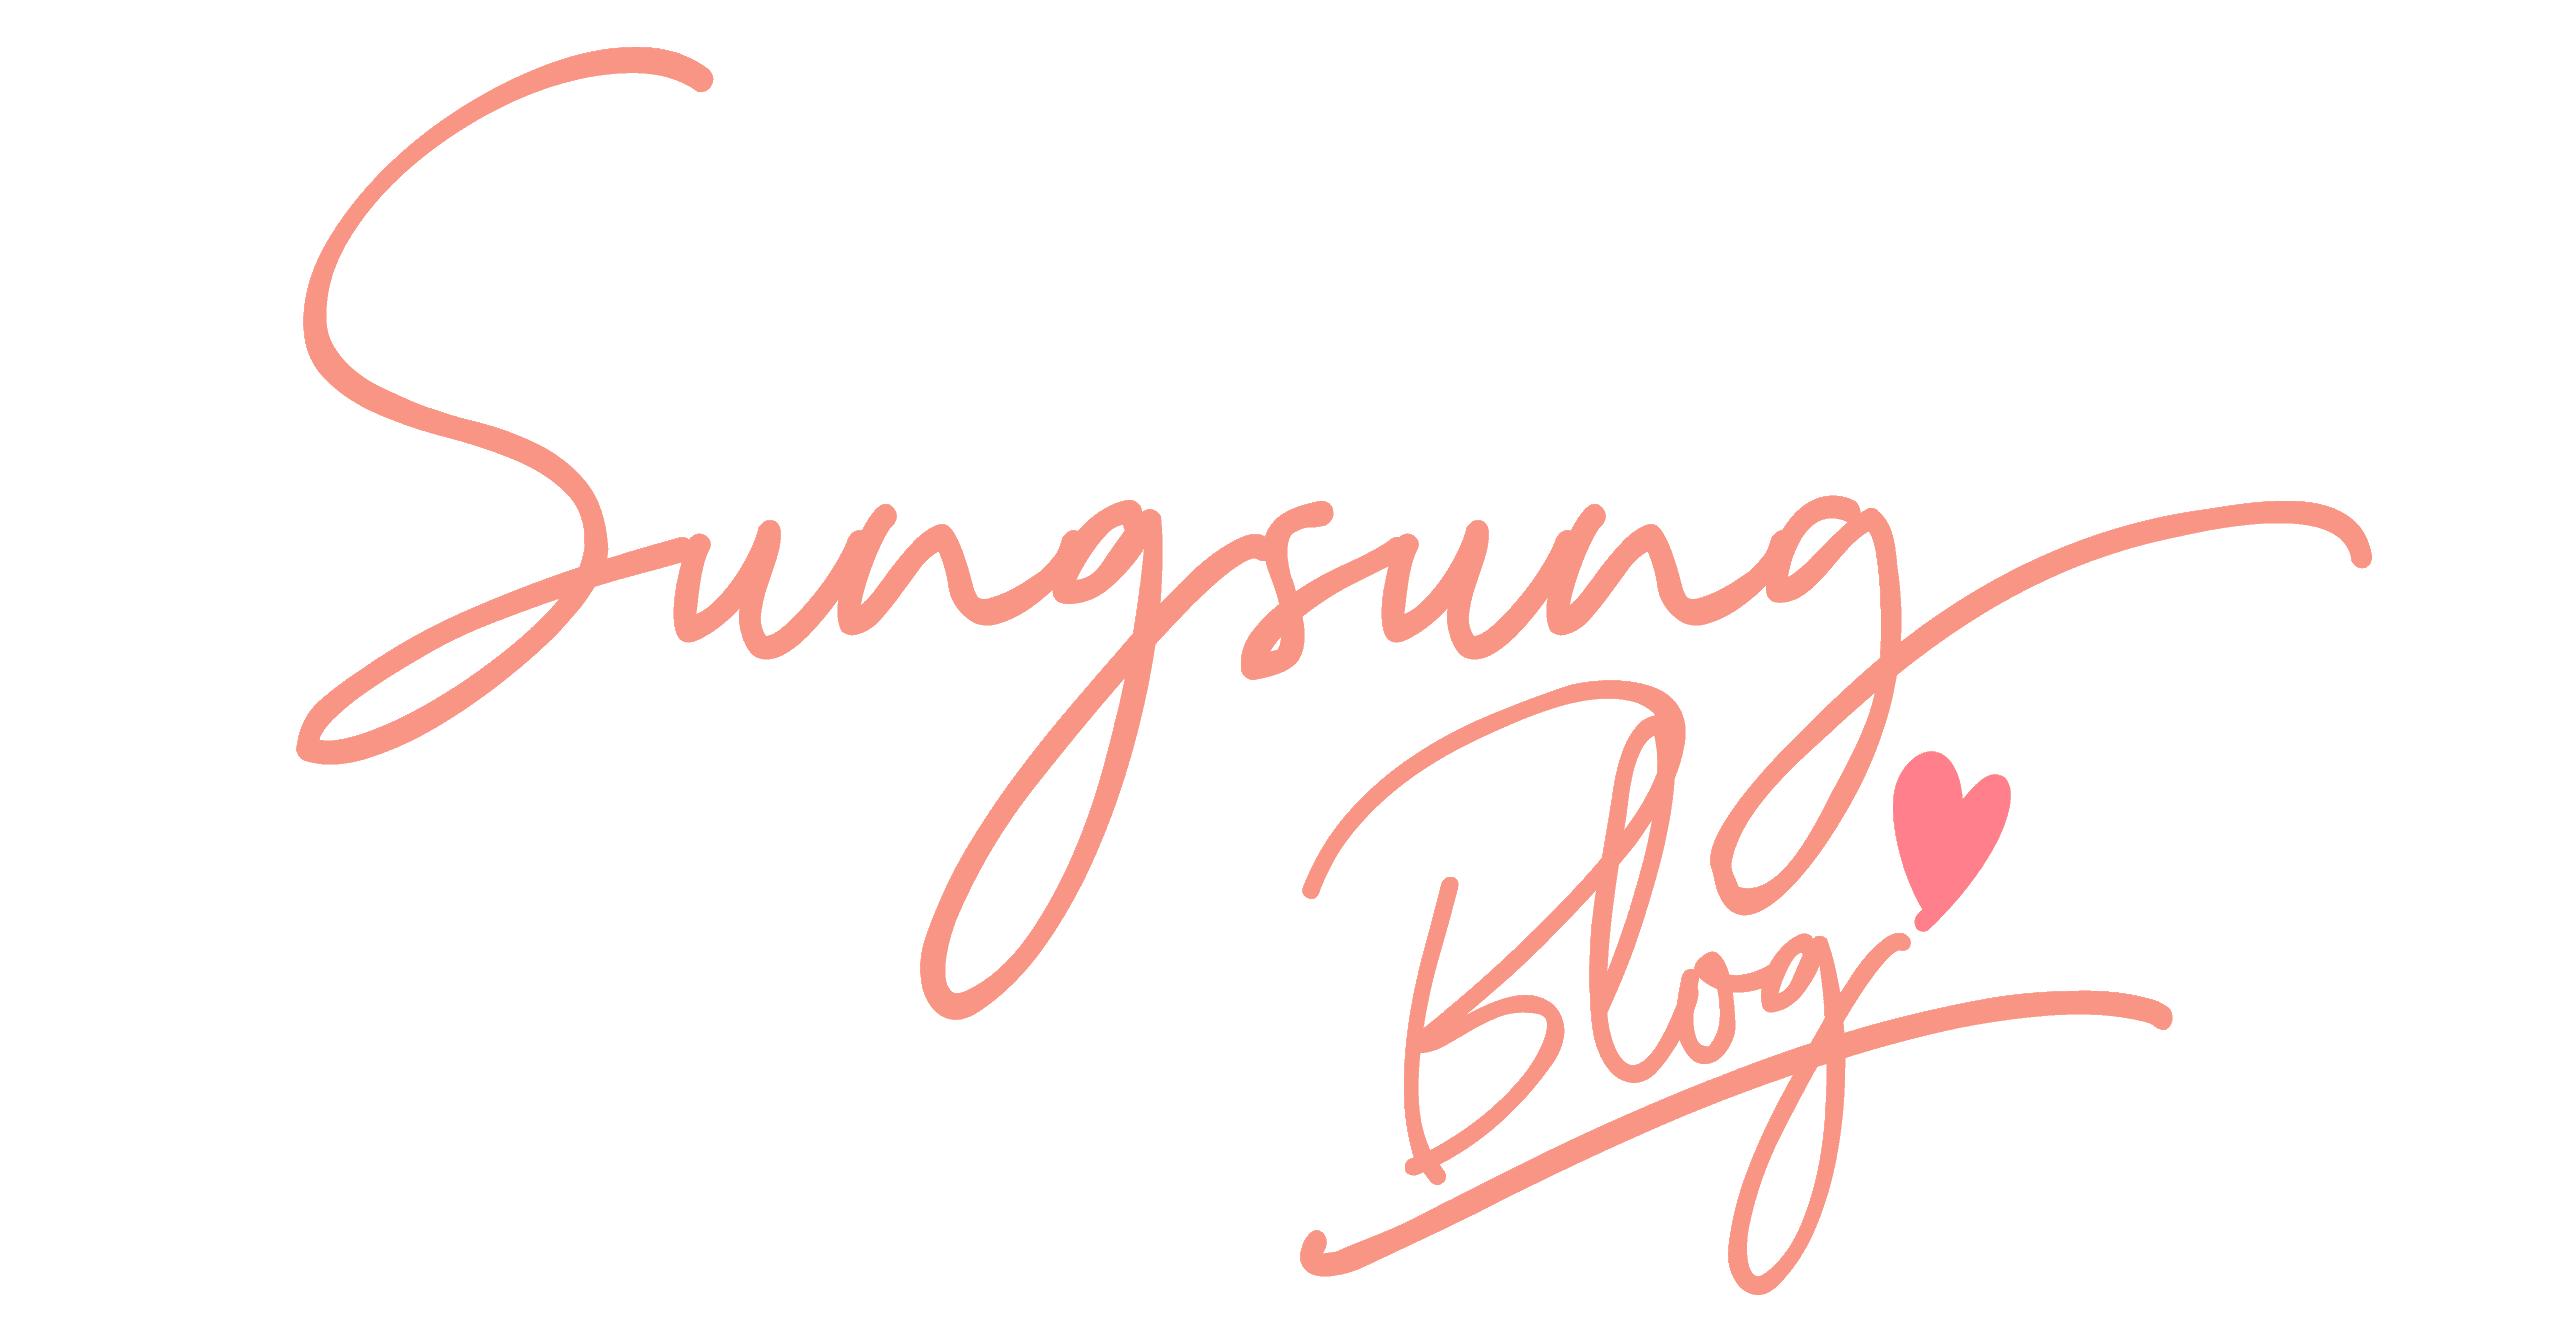 Sungsung-Blog